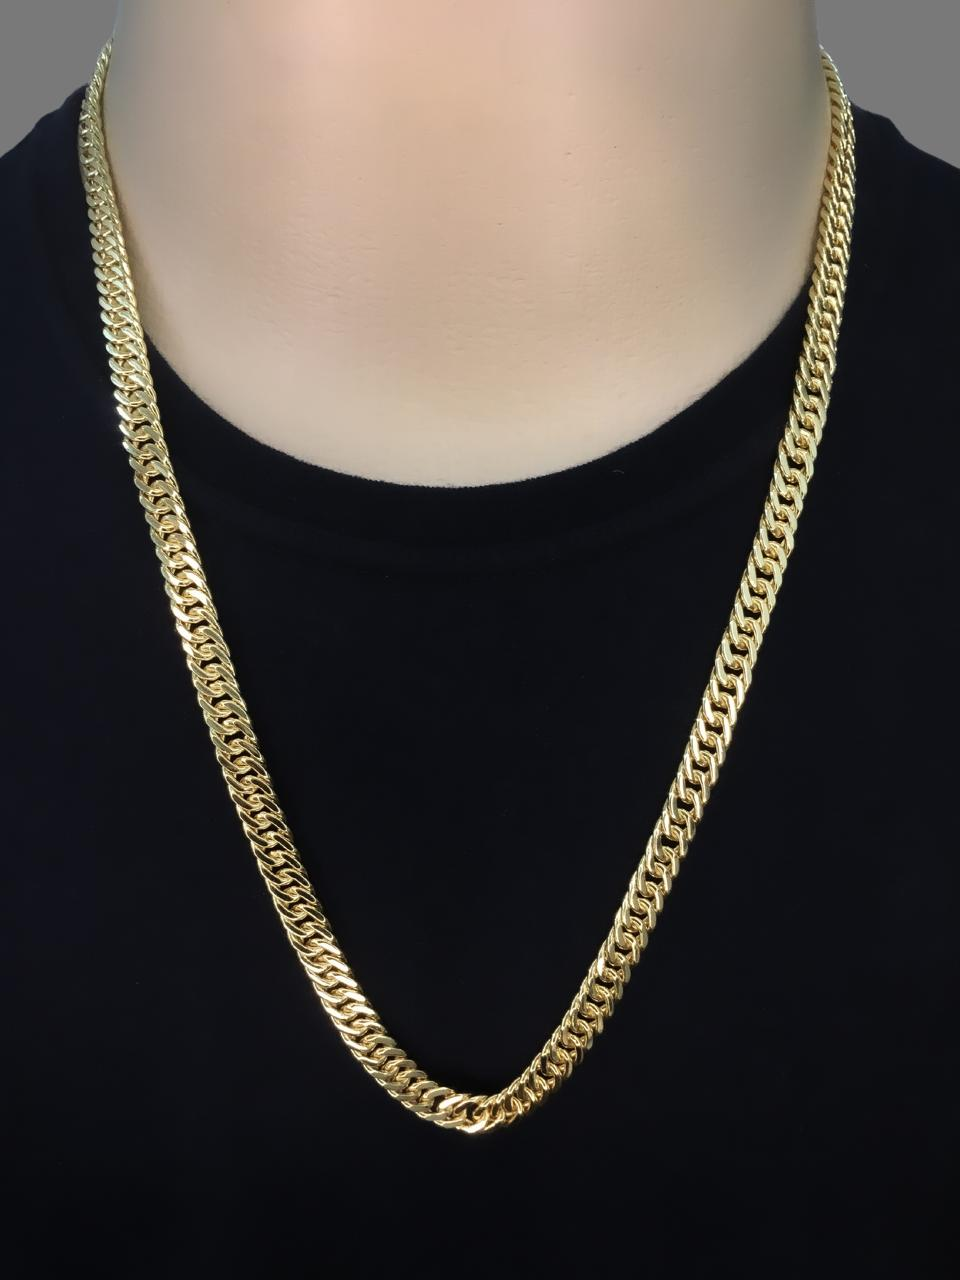 Corrente Grumet dupla -  7 milímetros - 70 Centímetros - fecho Gaveta trava dupla  - Banhado a ouro 18 k